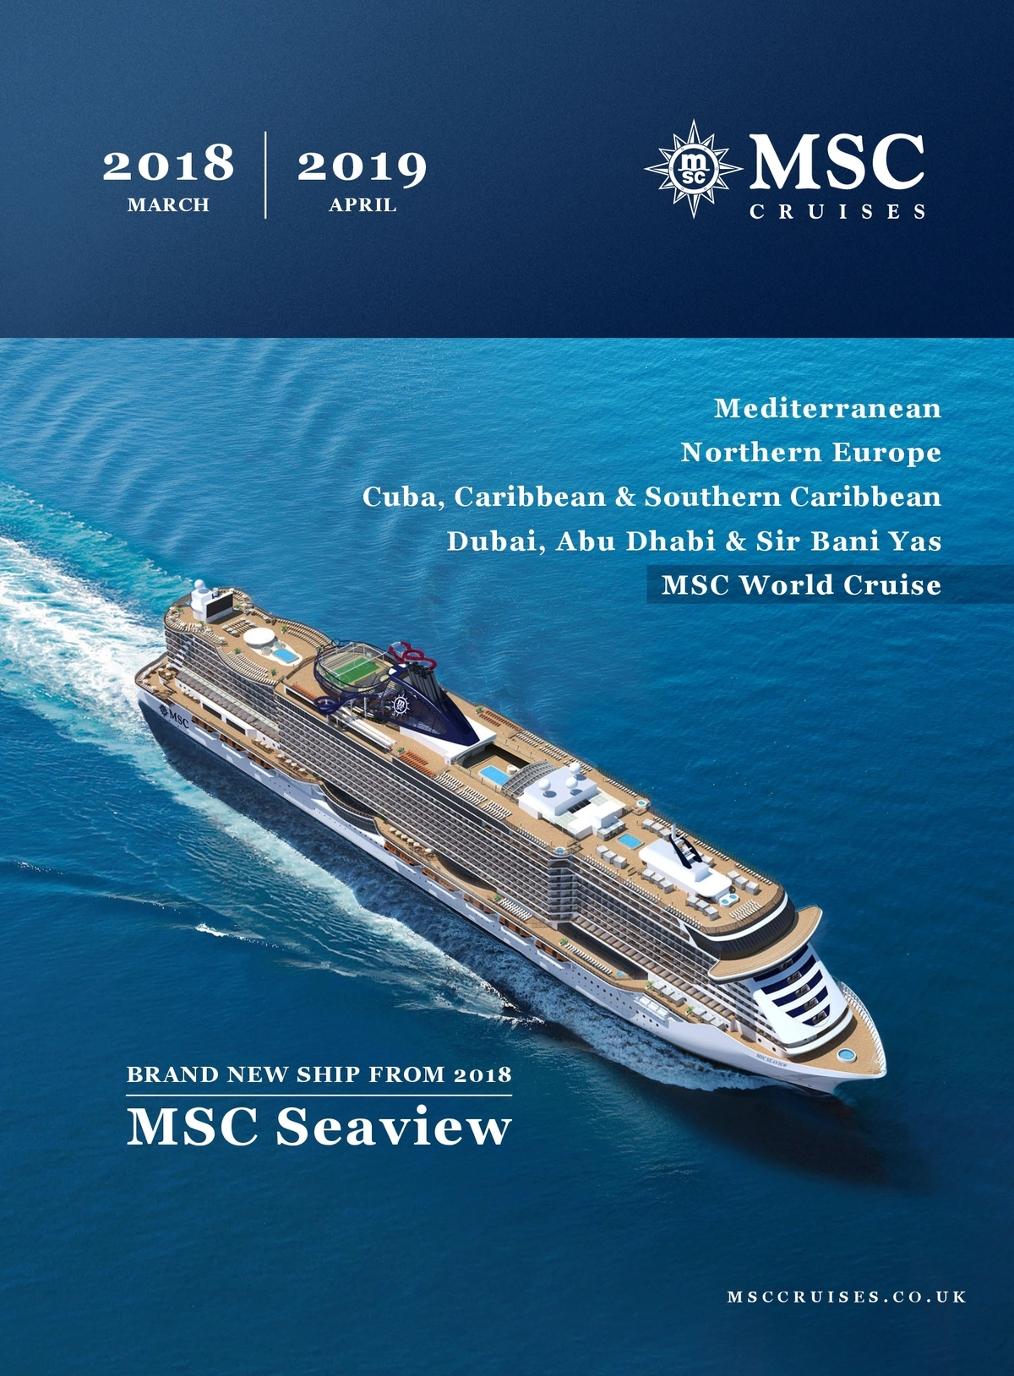 MSC Cruises - Brochure 2018-2019